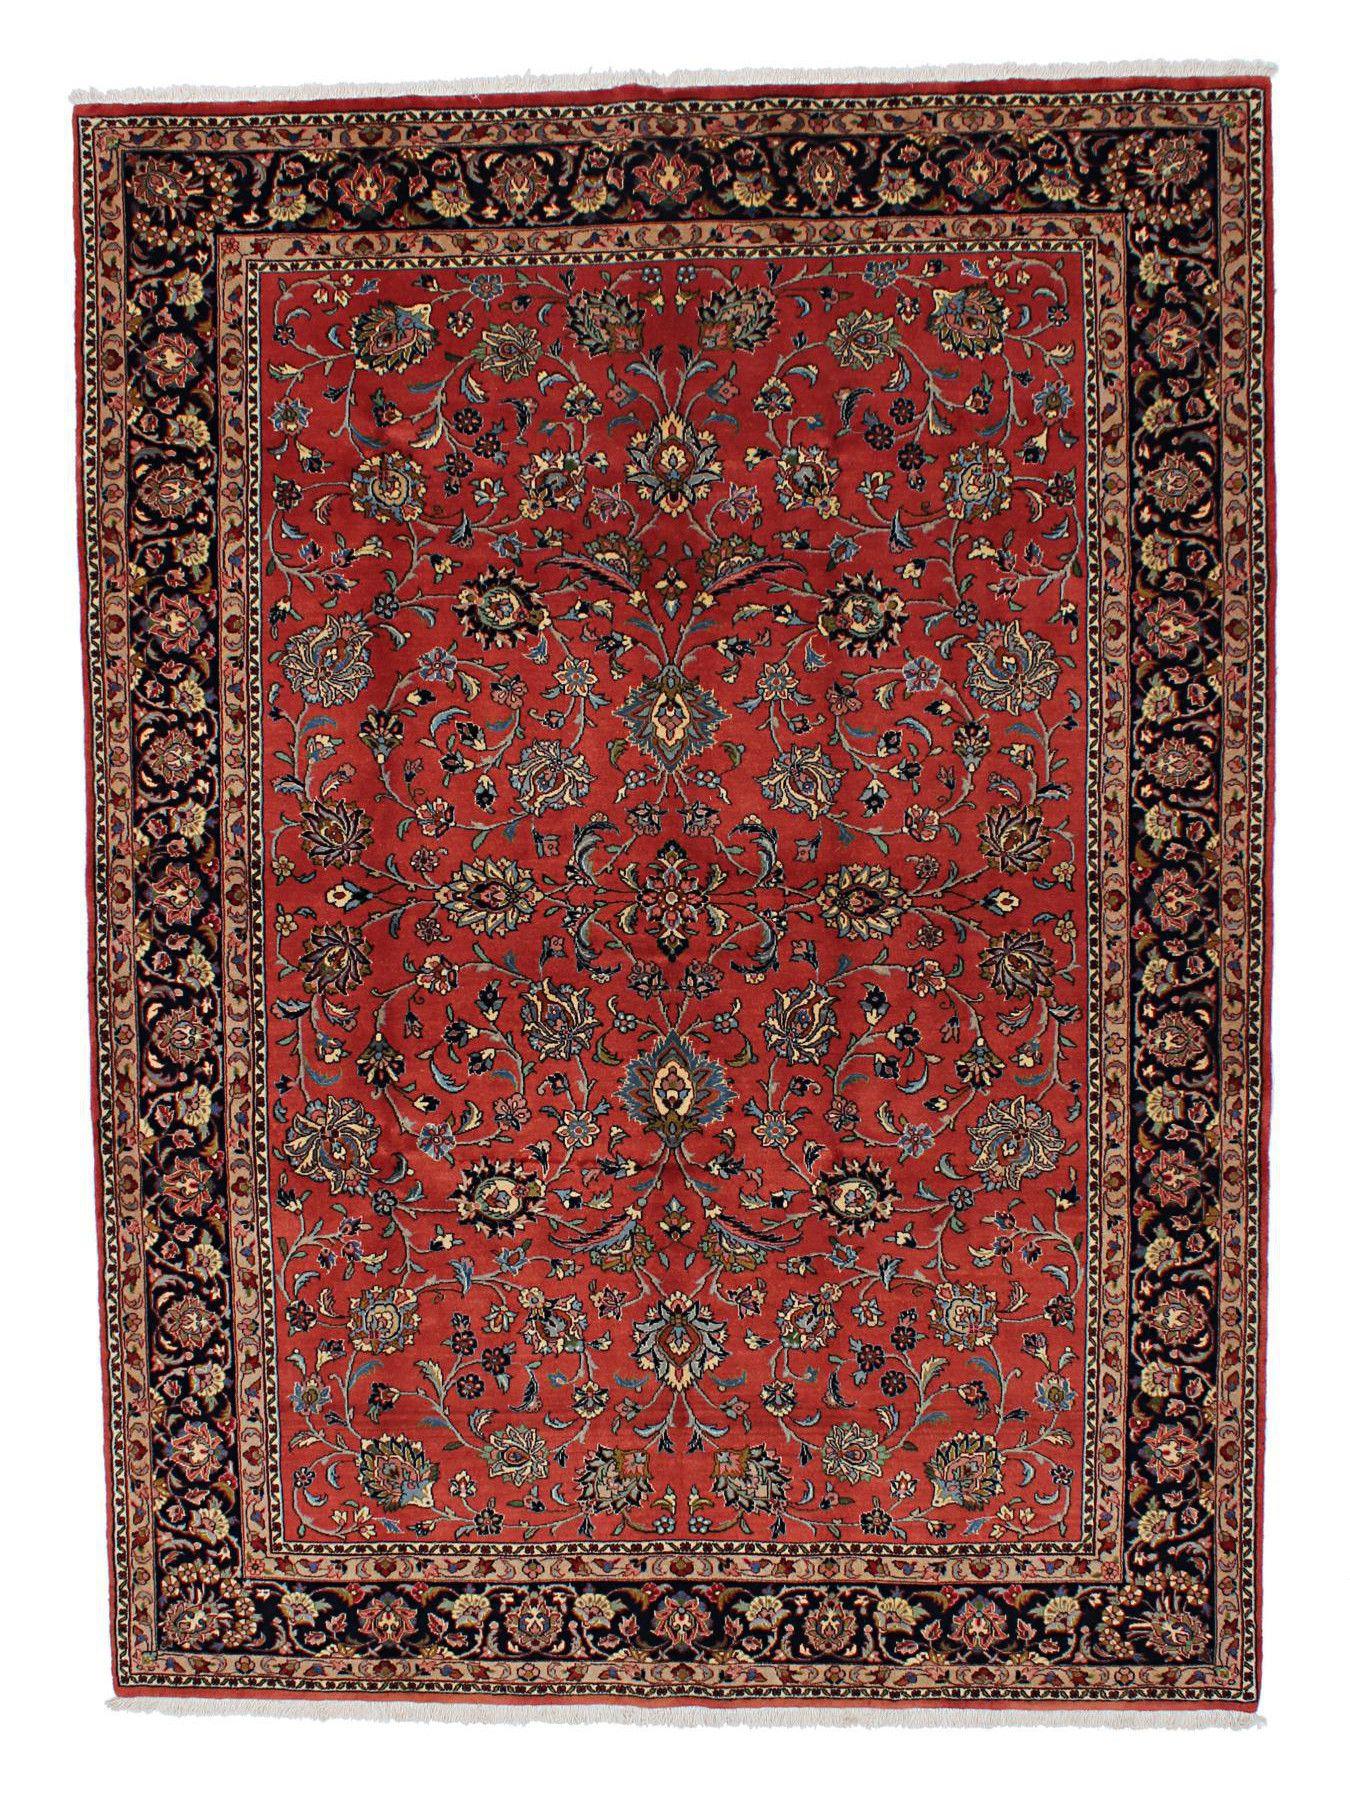 Tapis persans - Sarough Sherkat  Dimensions:284x203cm